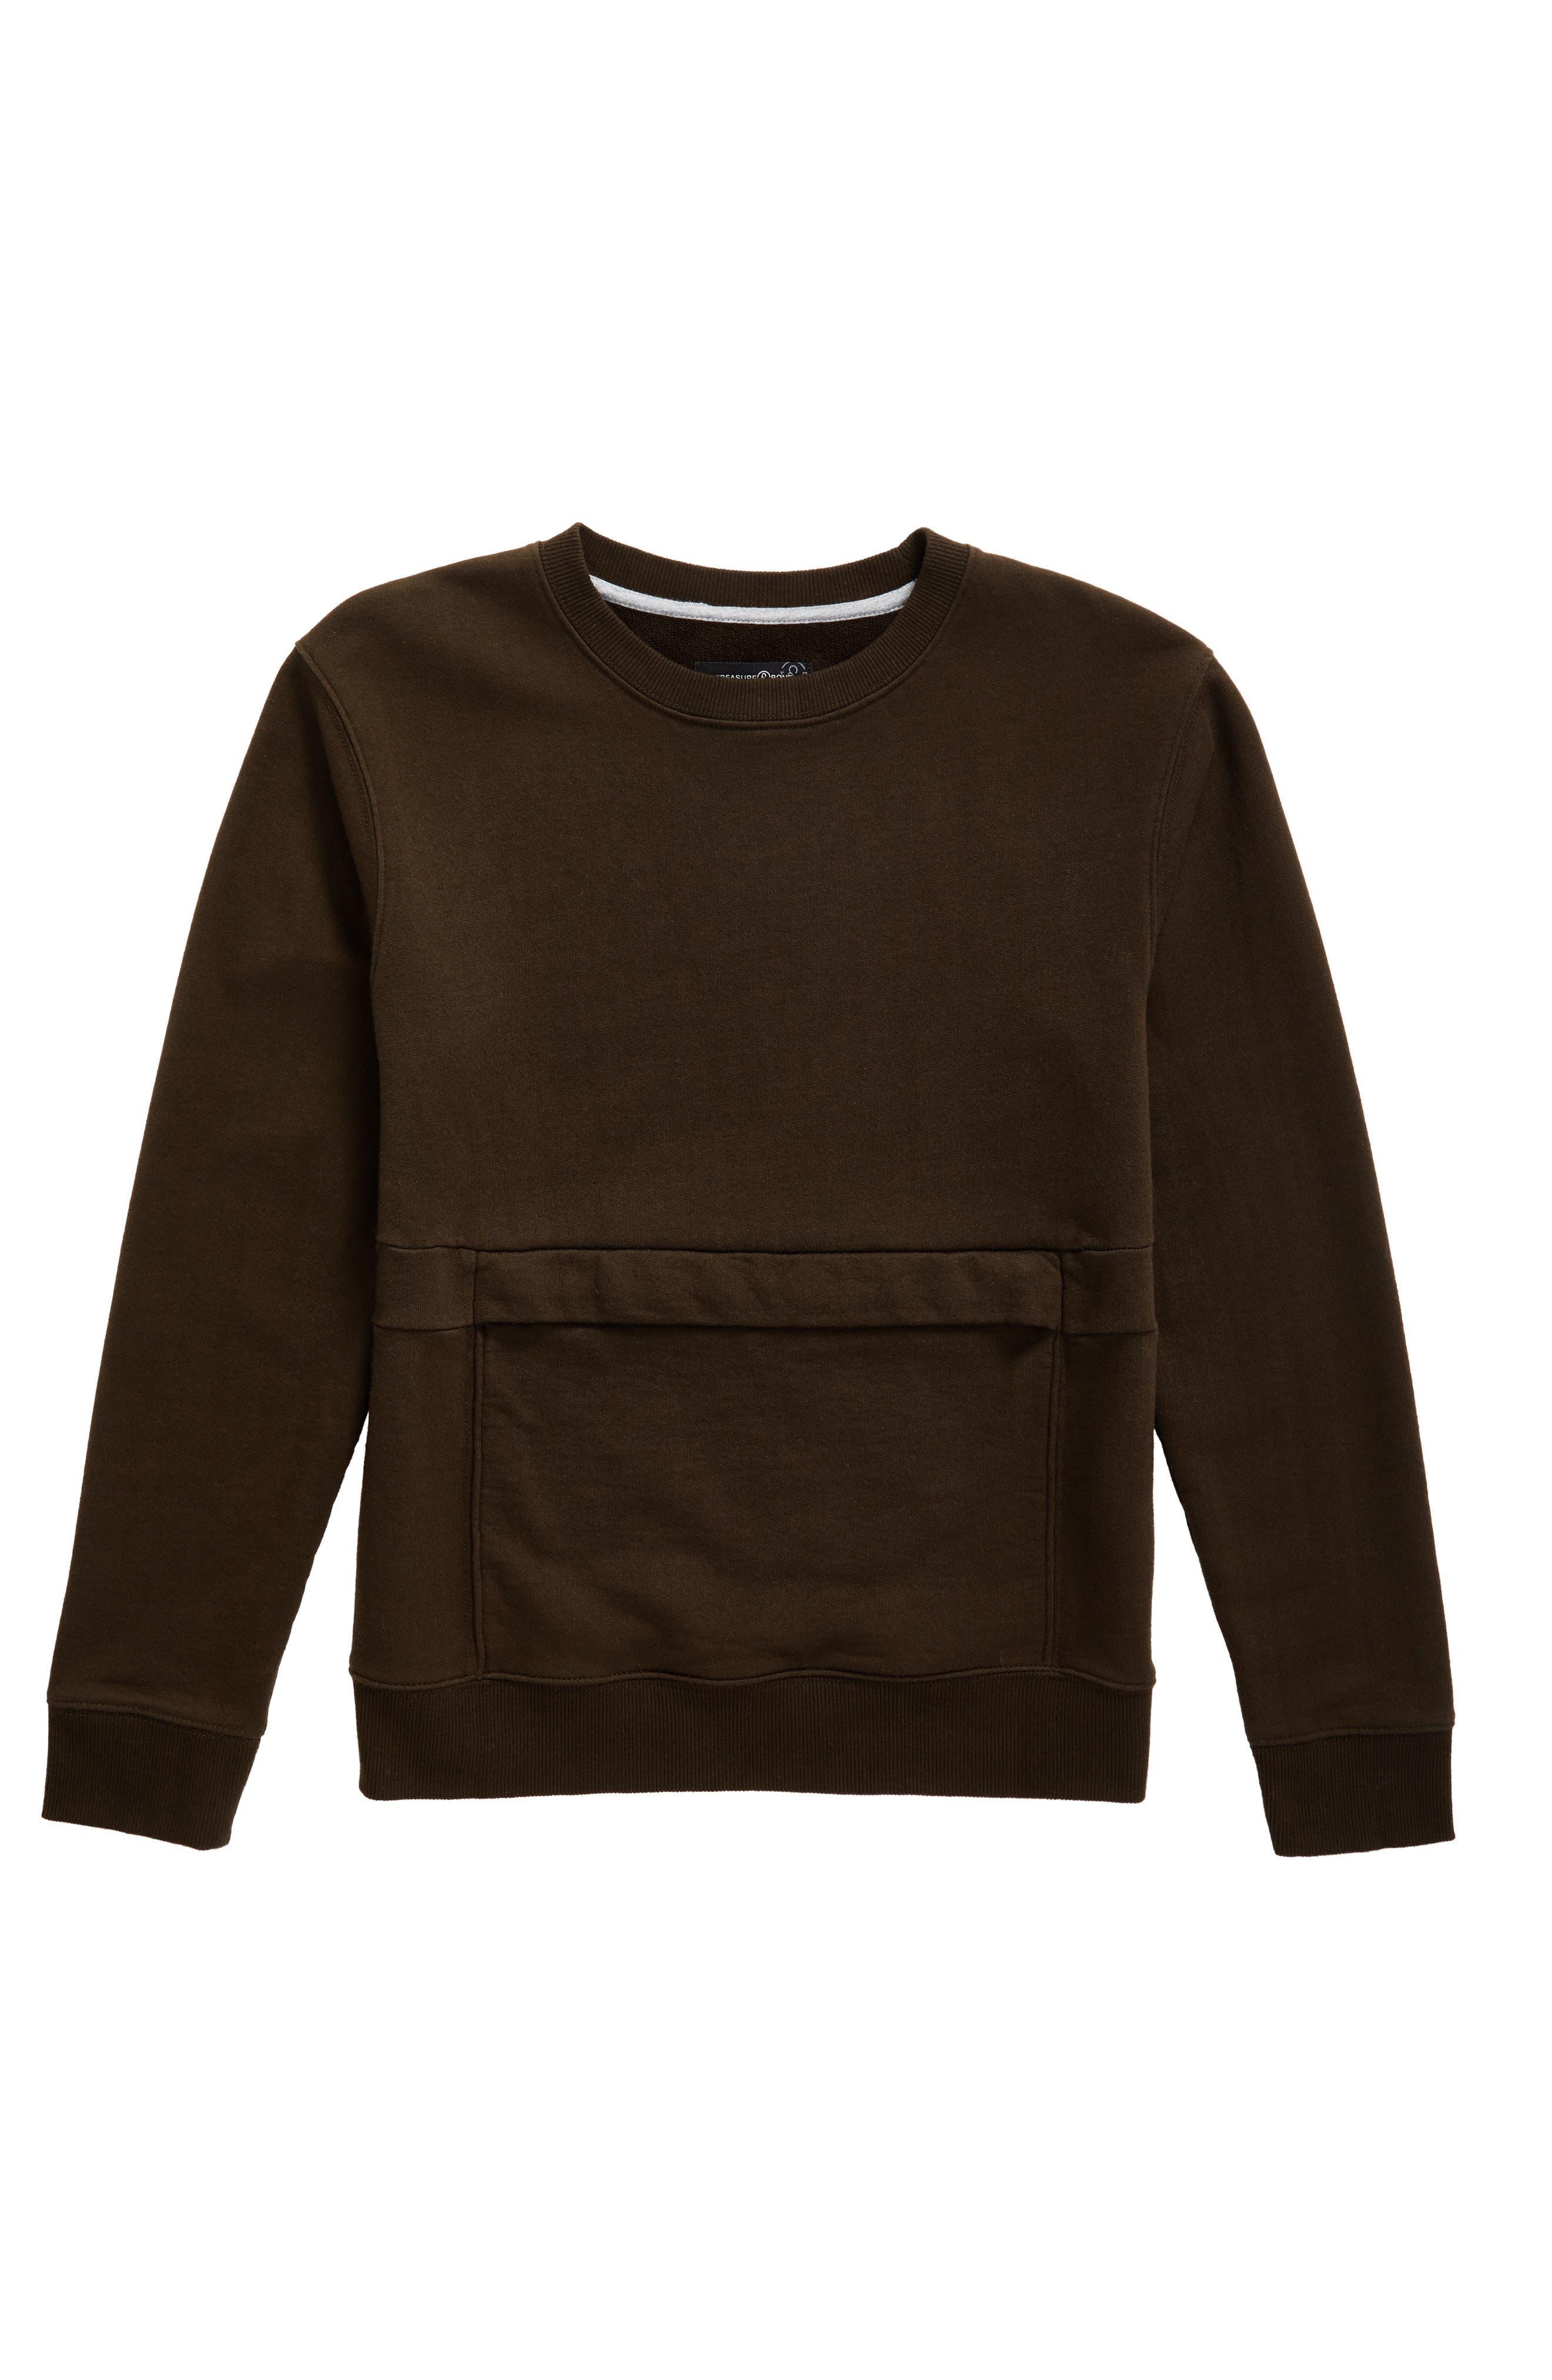 Main Image - Treasure & Bond Pouch Pocket Sweatshirt (Big Boys)